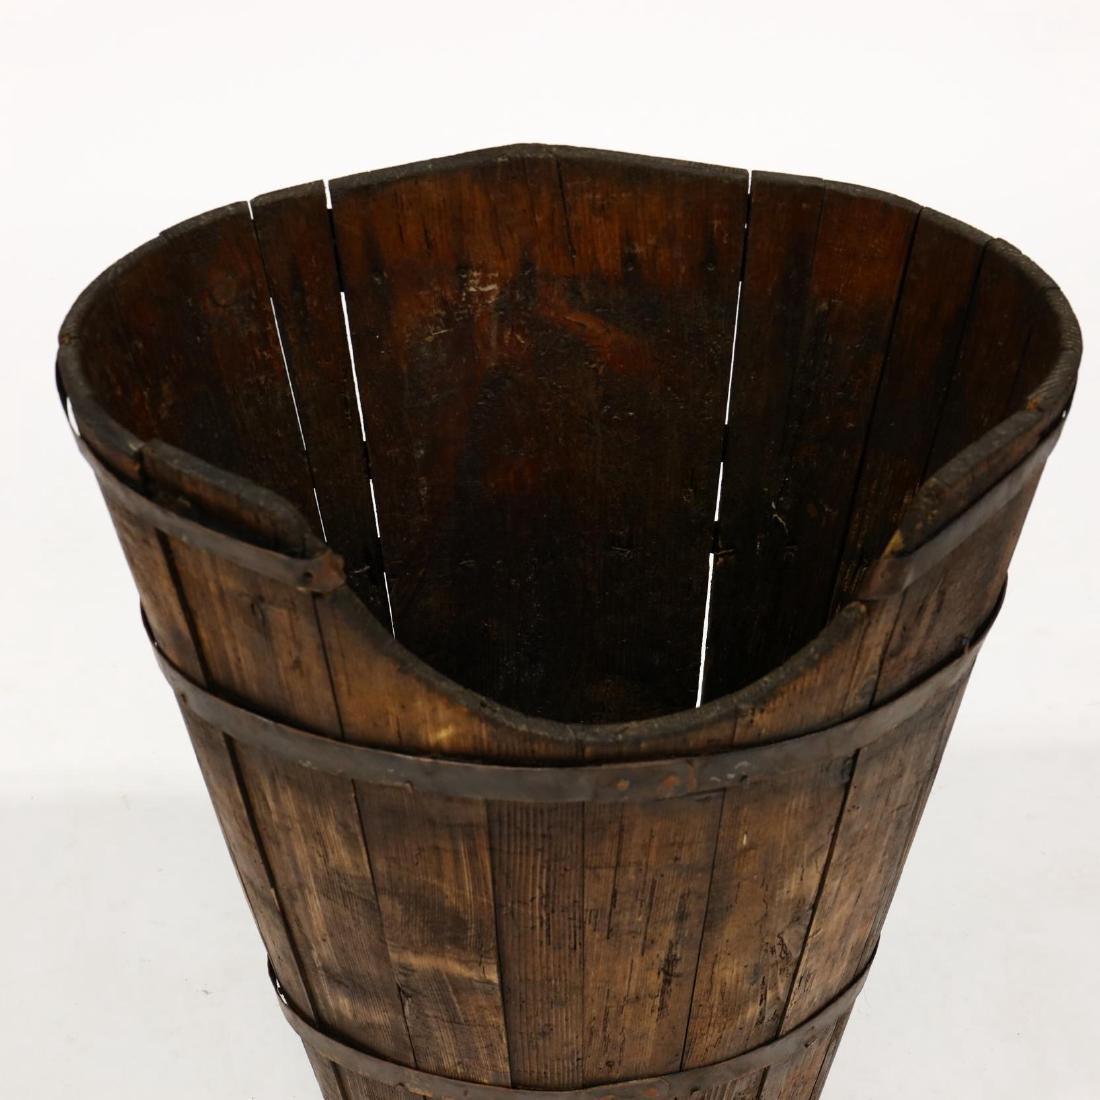 Antique French  Hotte  Grape Gathering Barrel - 2